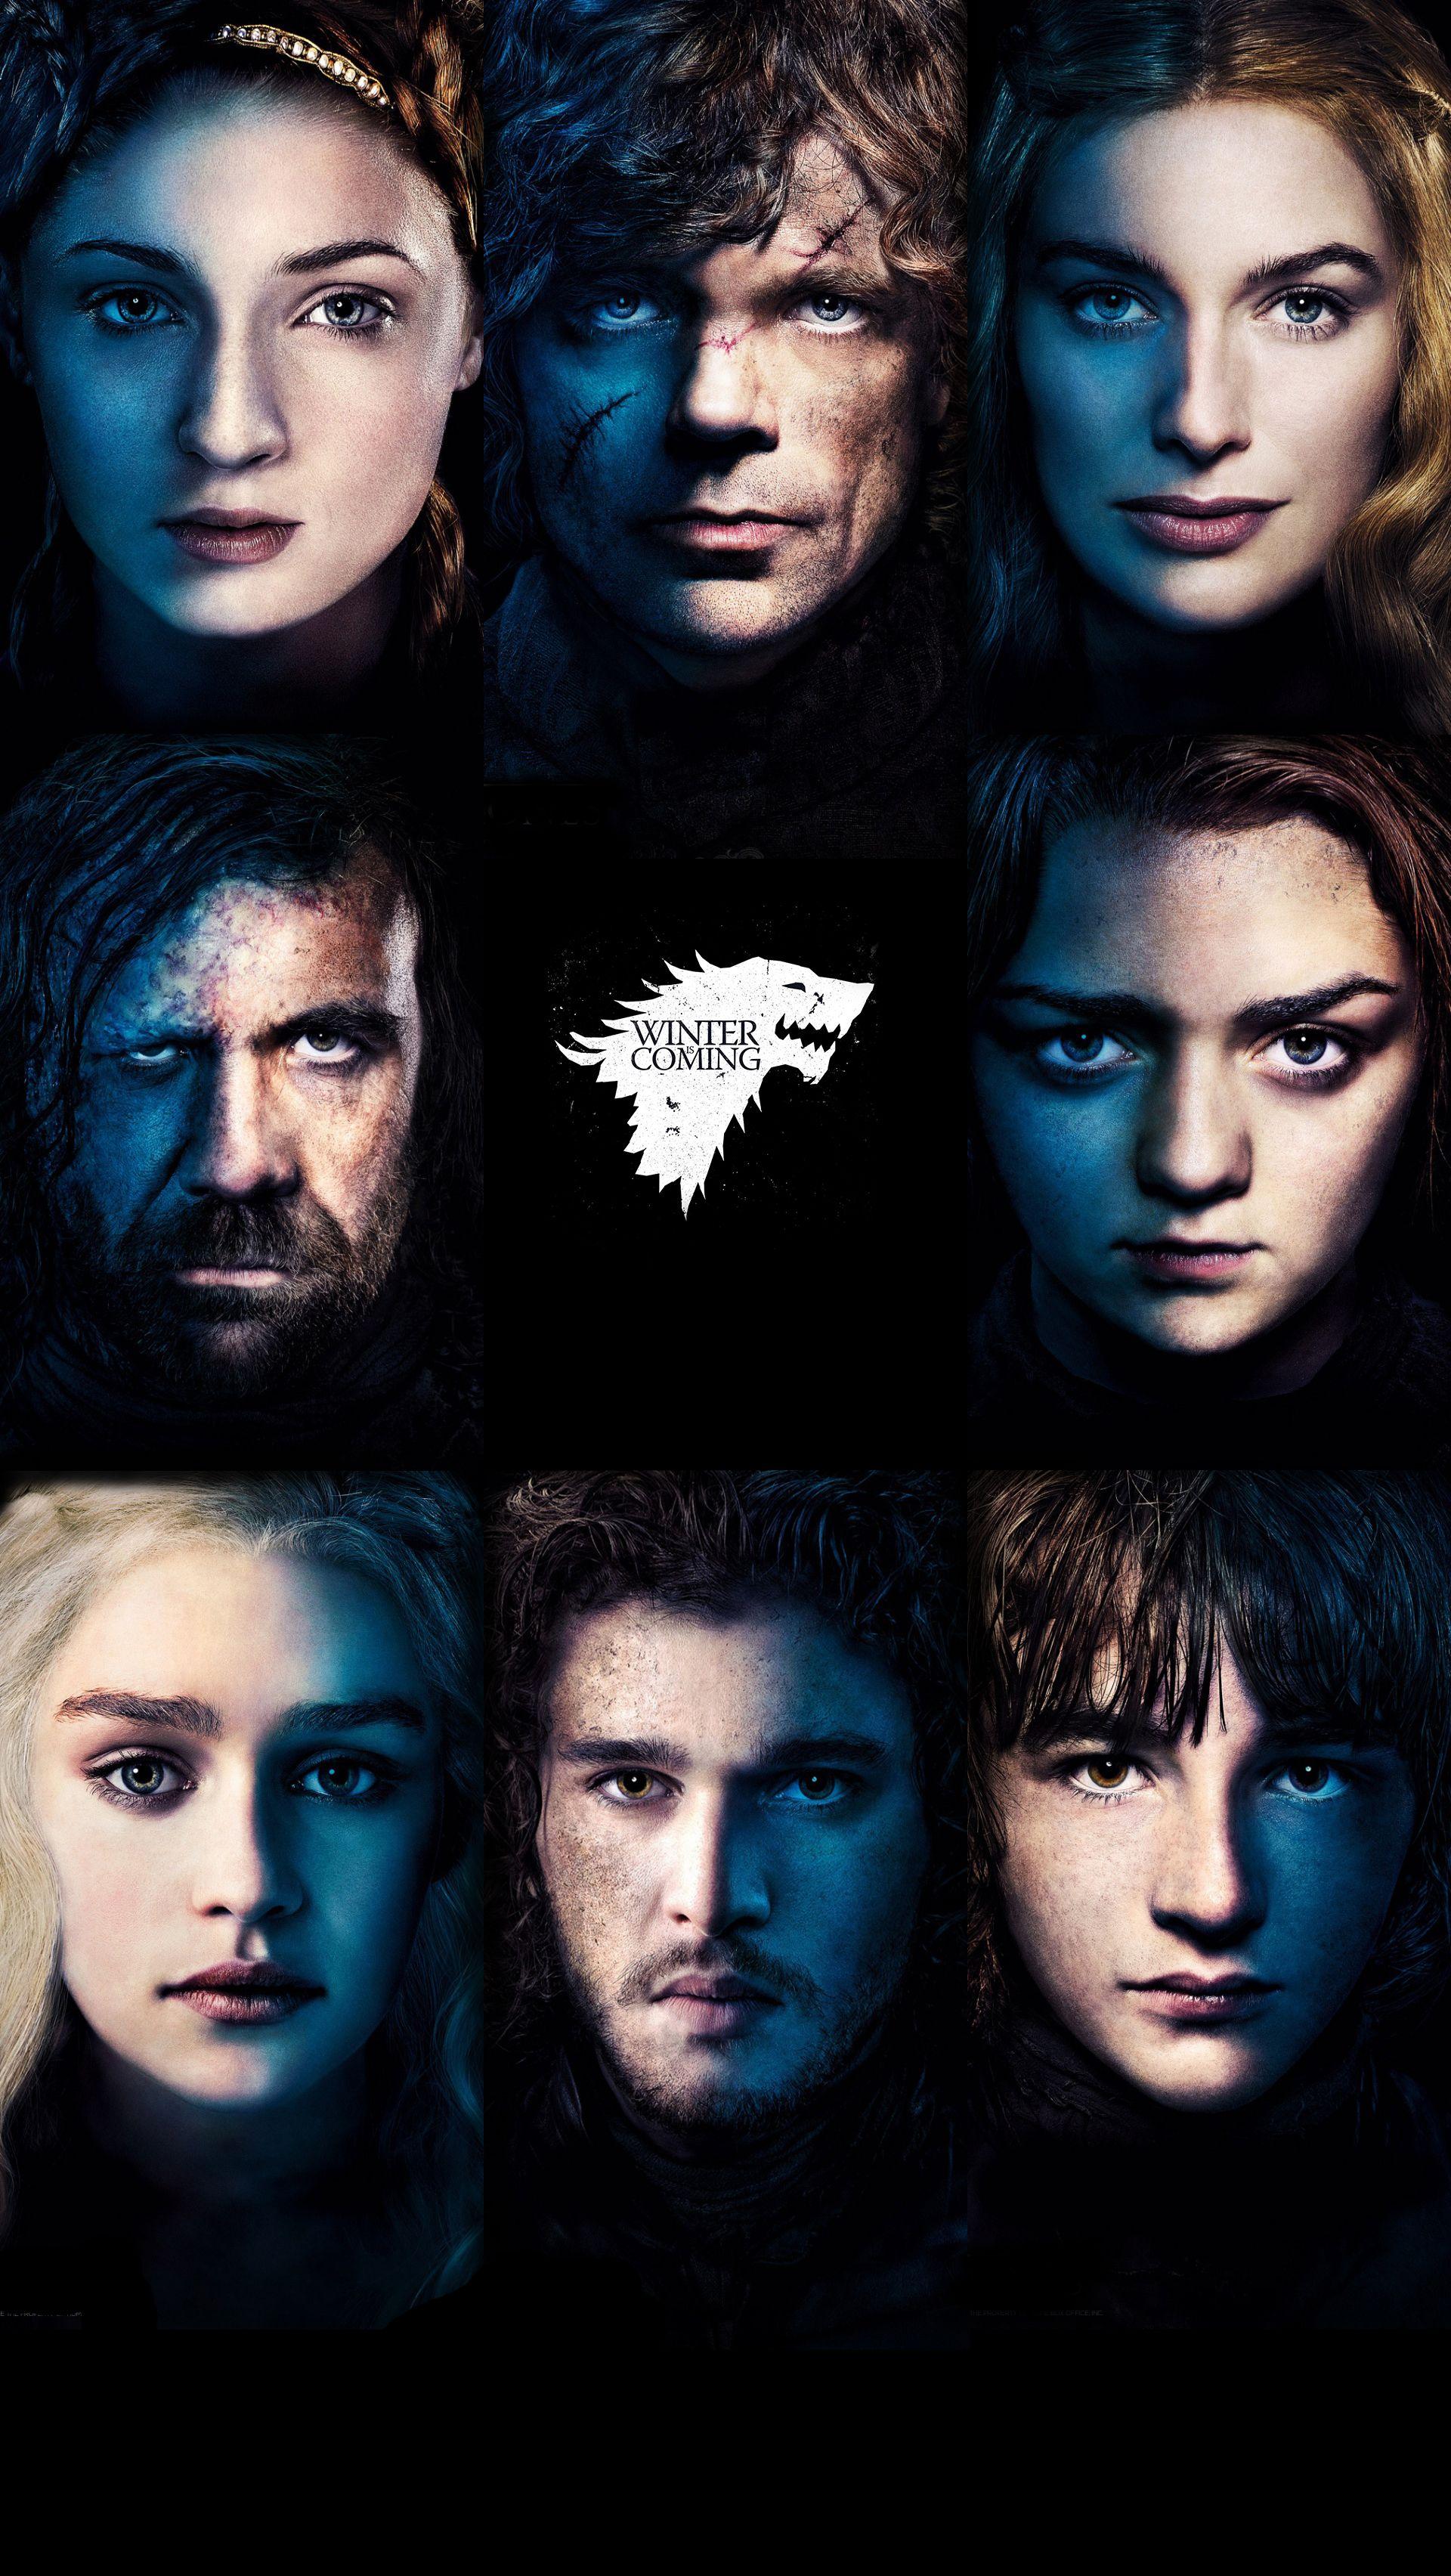 Game Of Thrones Iphone 5 5s 5c Wallpaper Wolf Stark Sansa Jon Tyrion